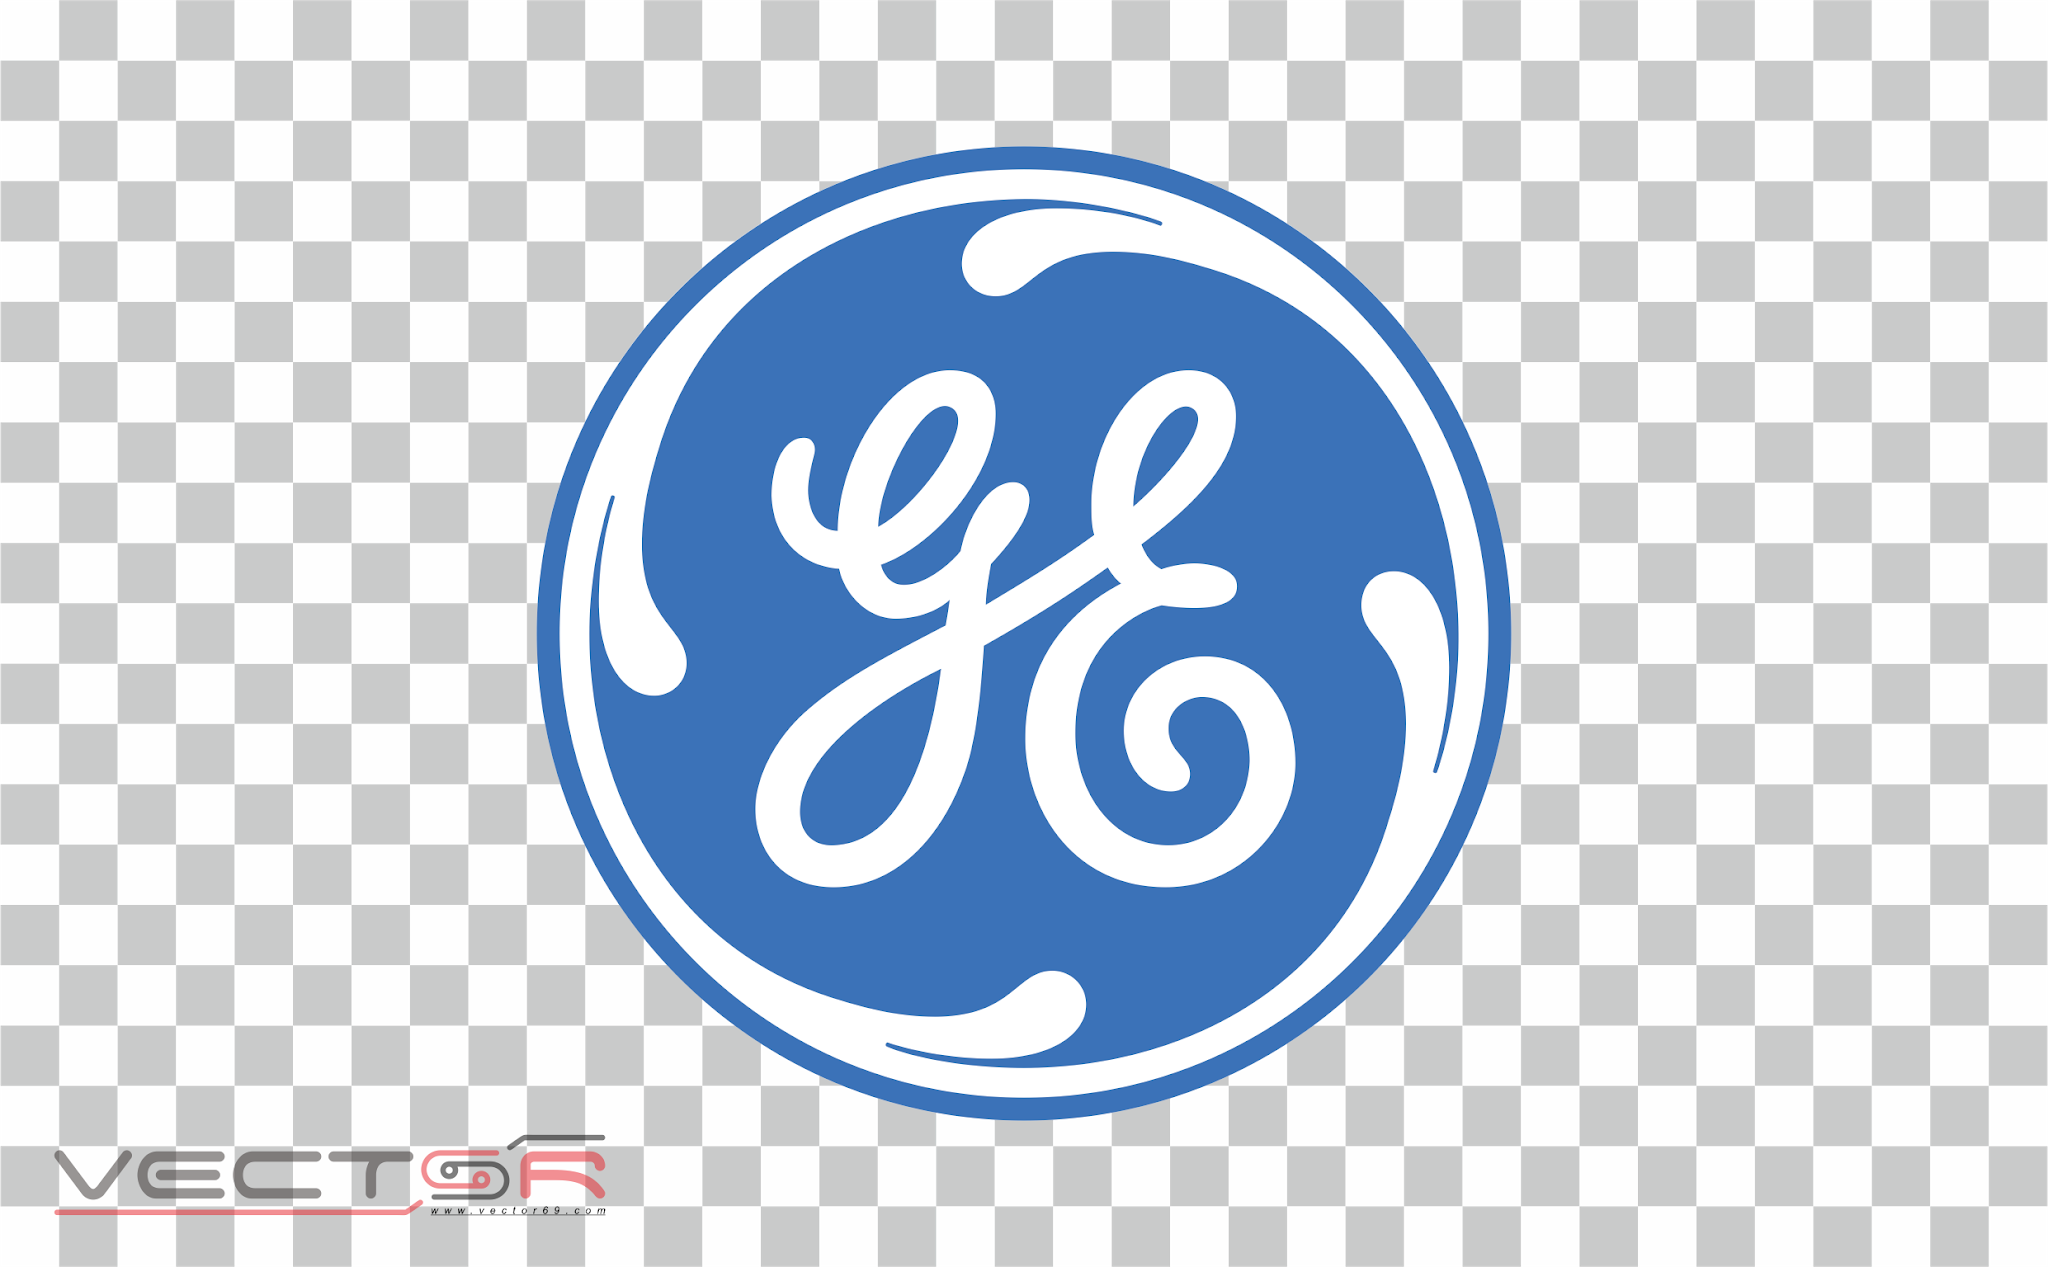 GE (General Electric) Logo - Download .PNG (Portable Network Graphics) Transparent Images